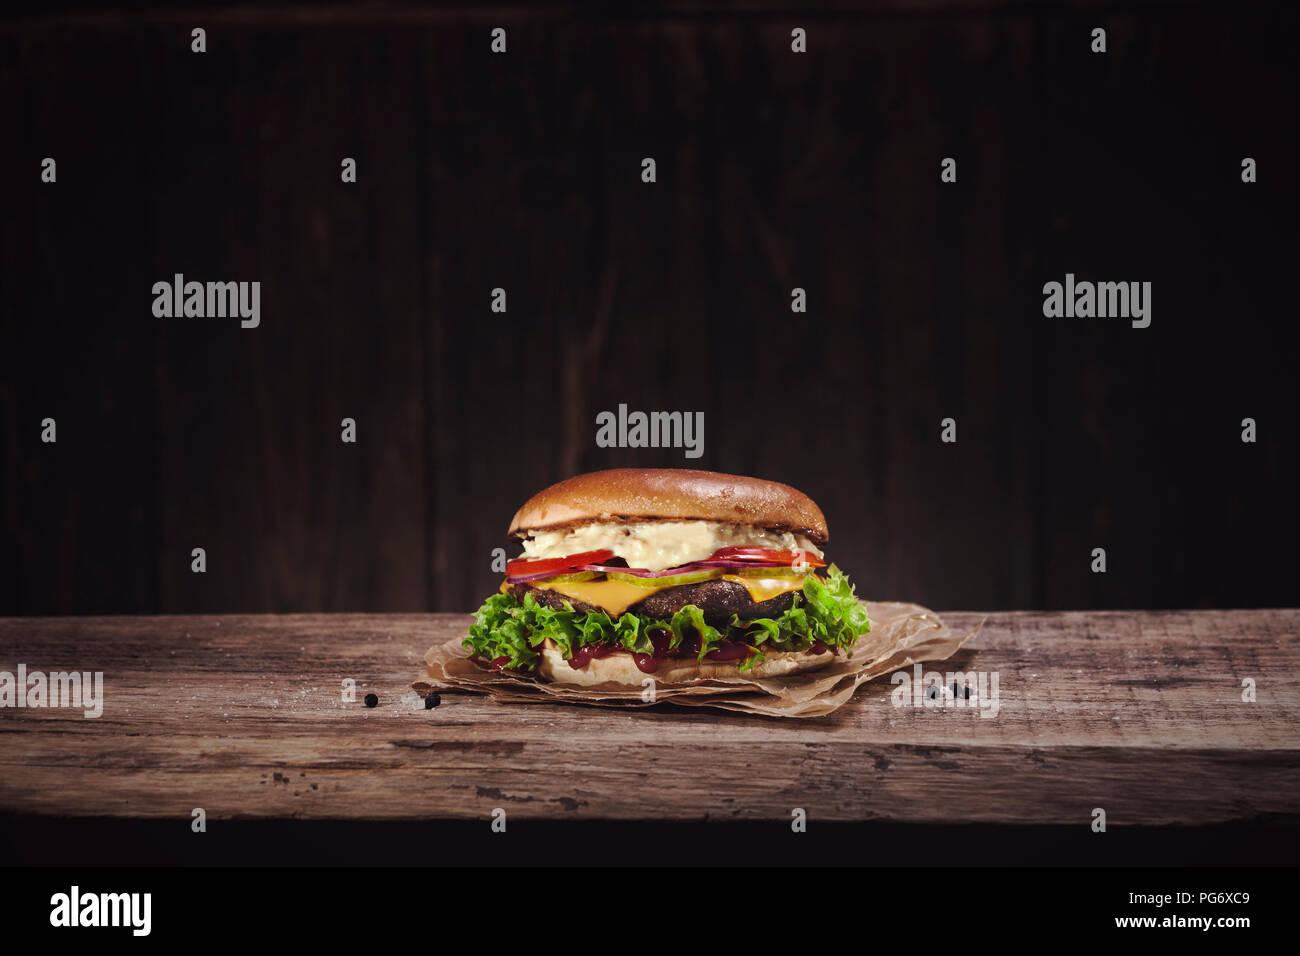 Cheeseburger Photo Stock